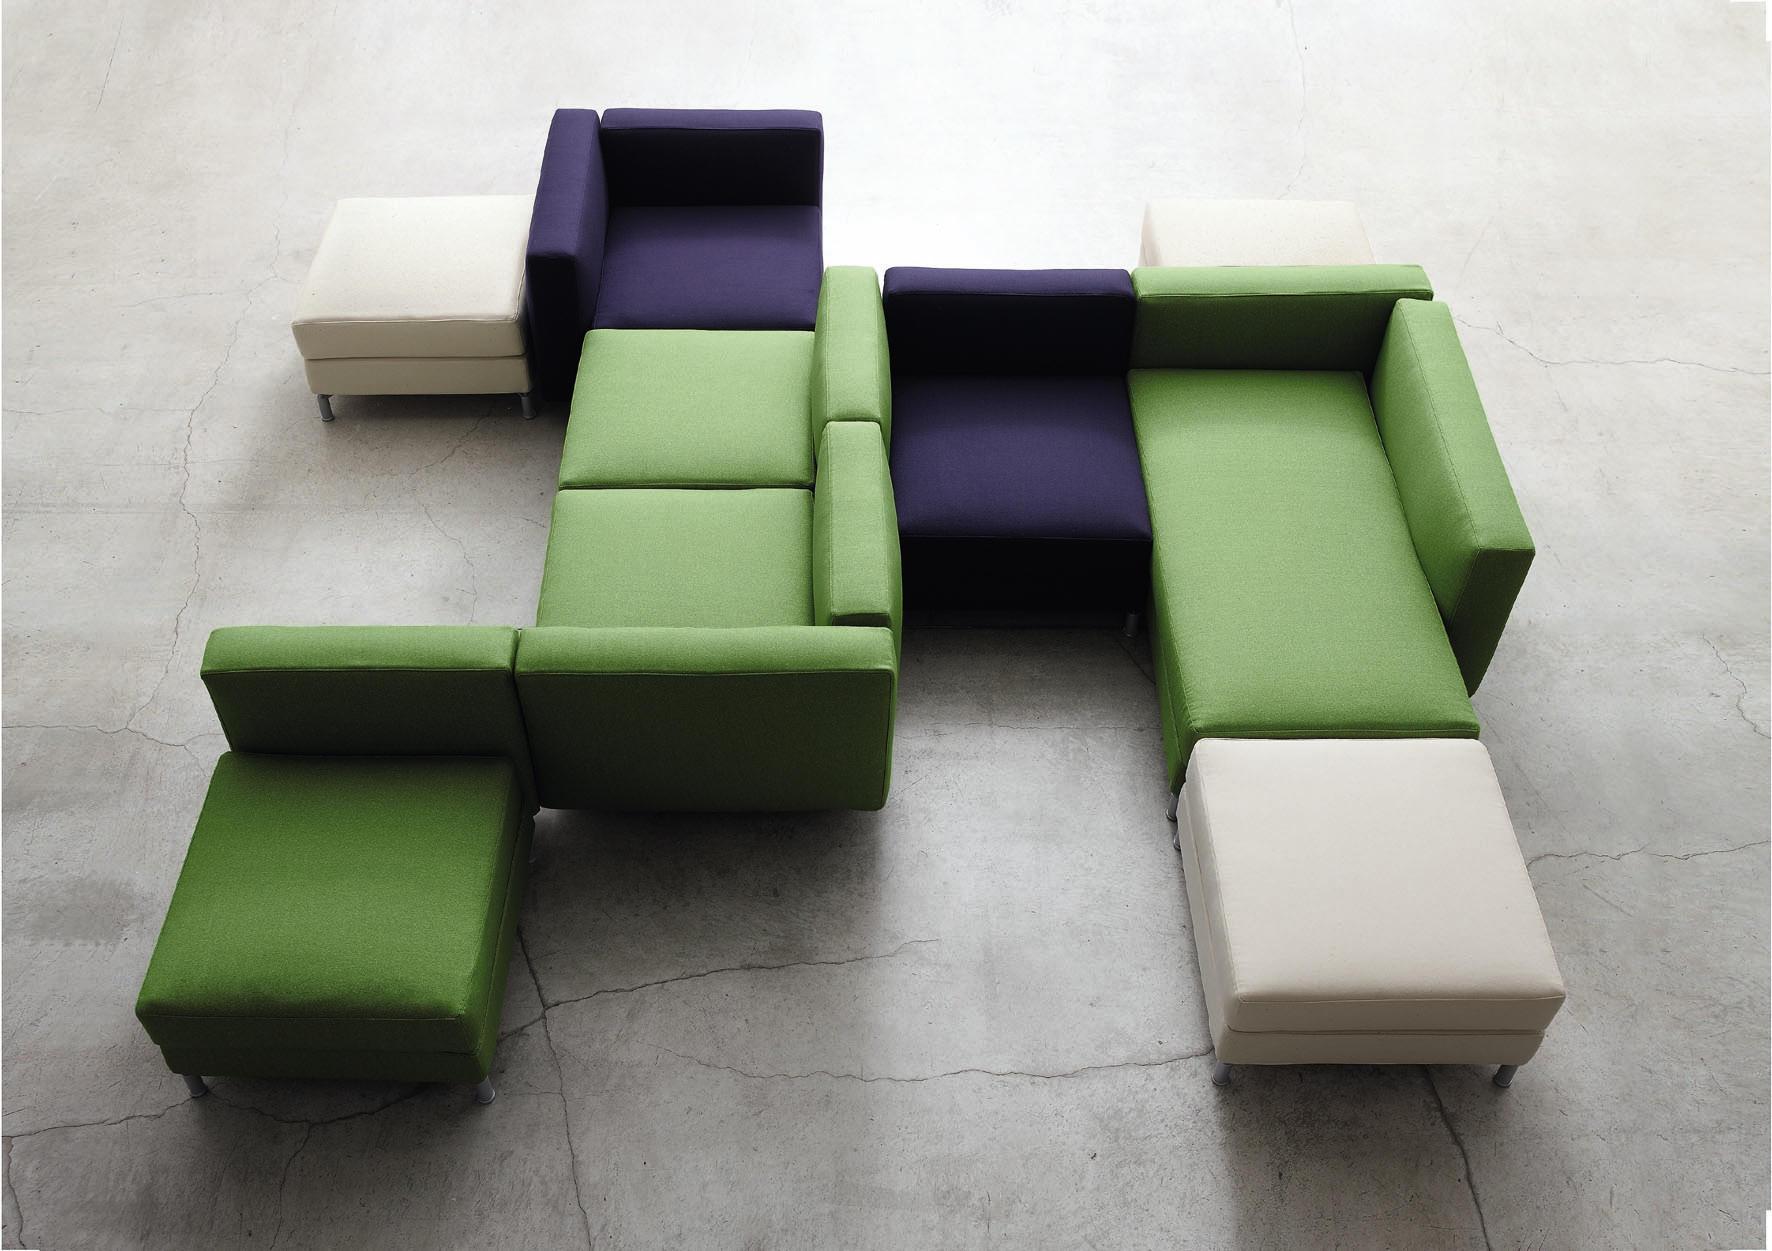 Passepartout modular seating system modular seating for Divani componibili